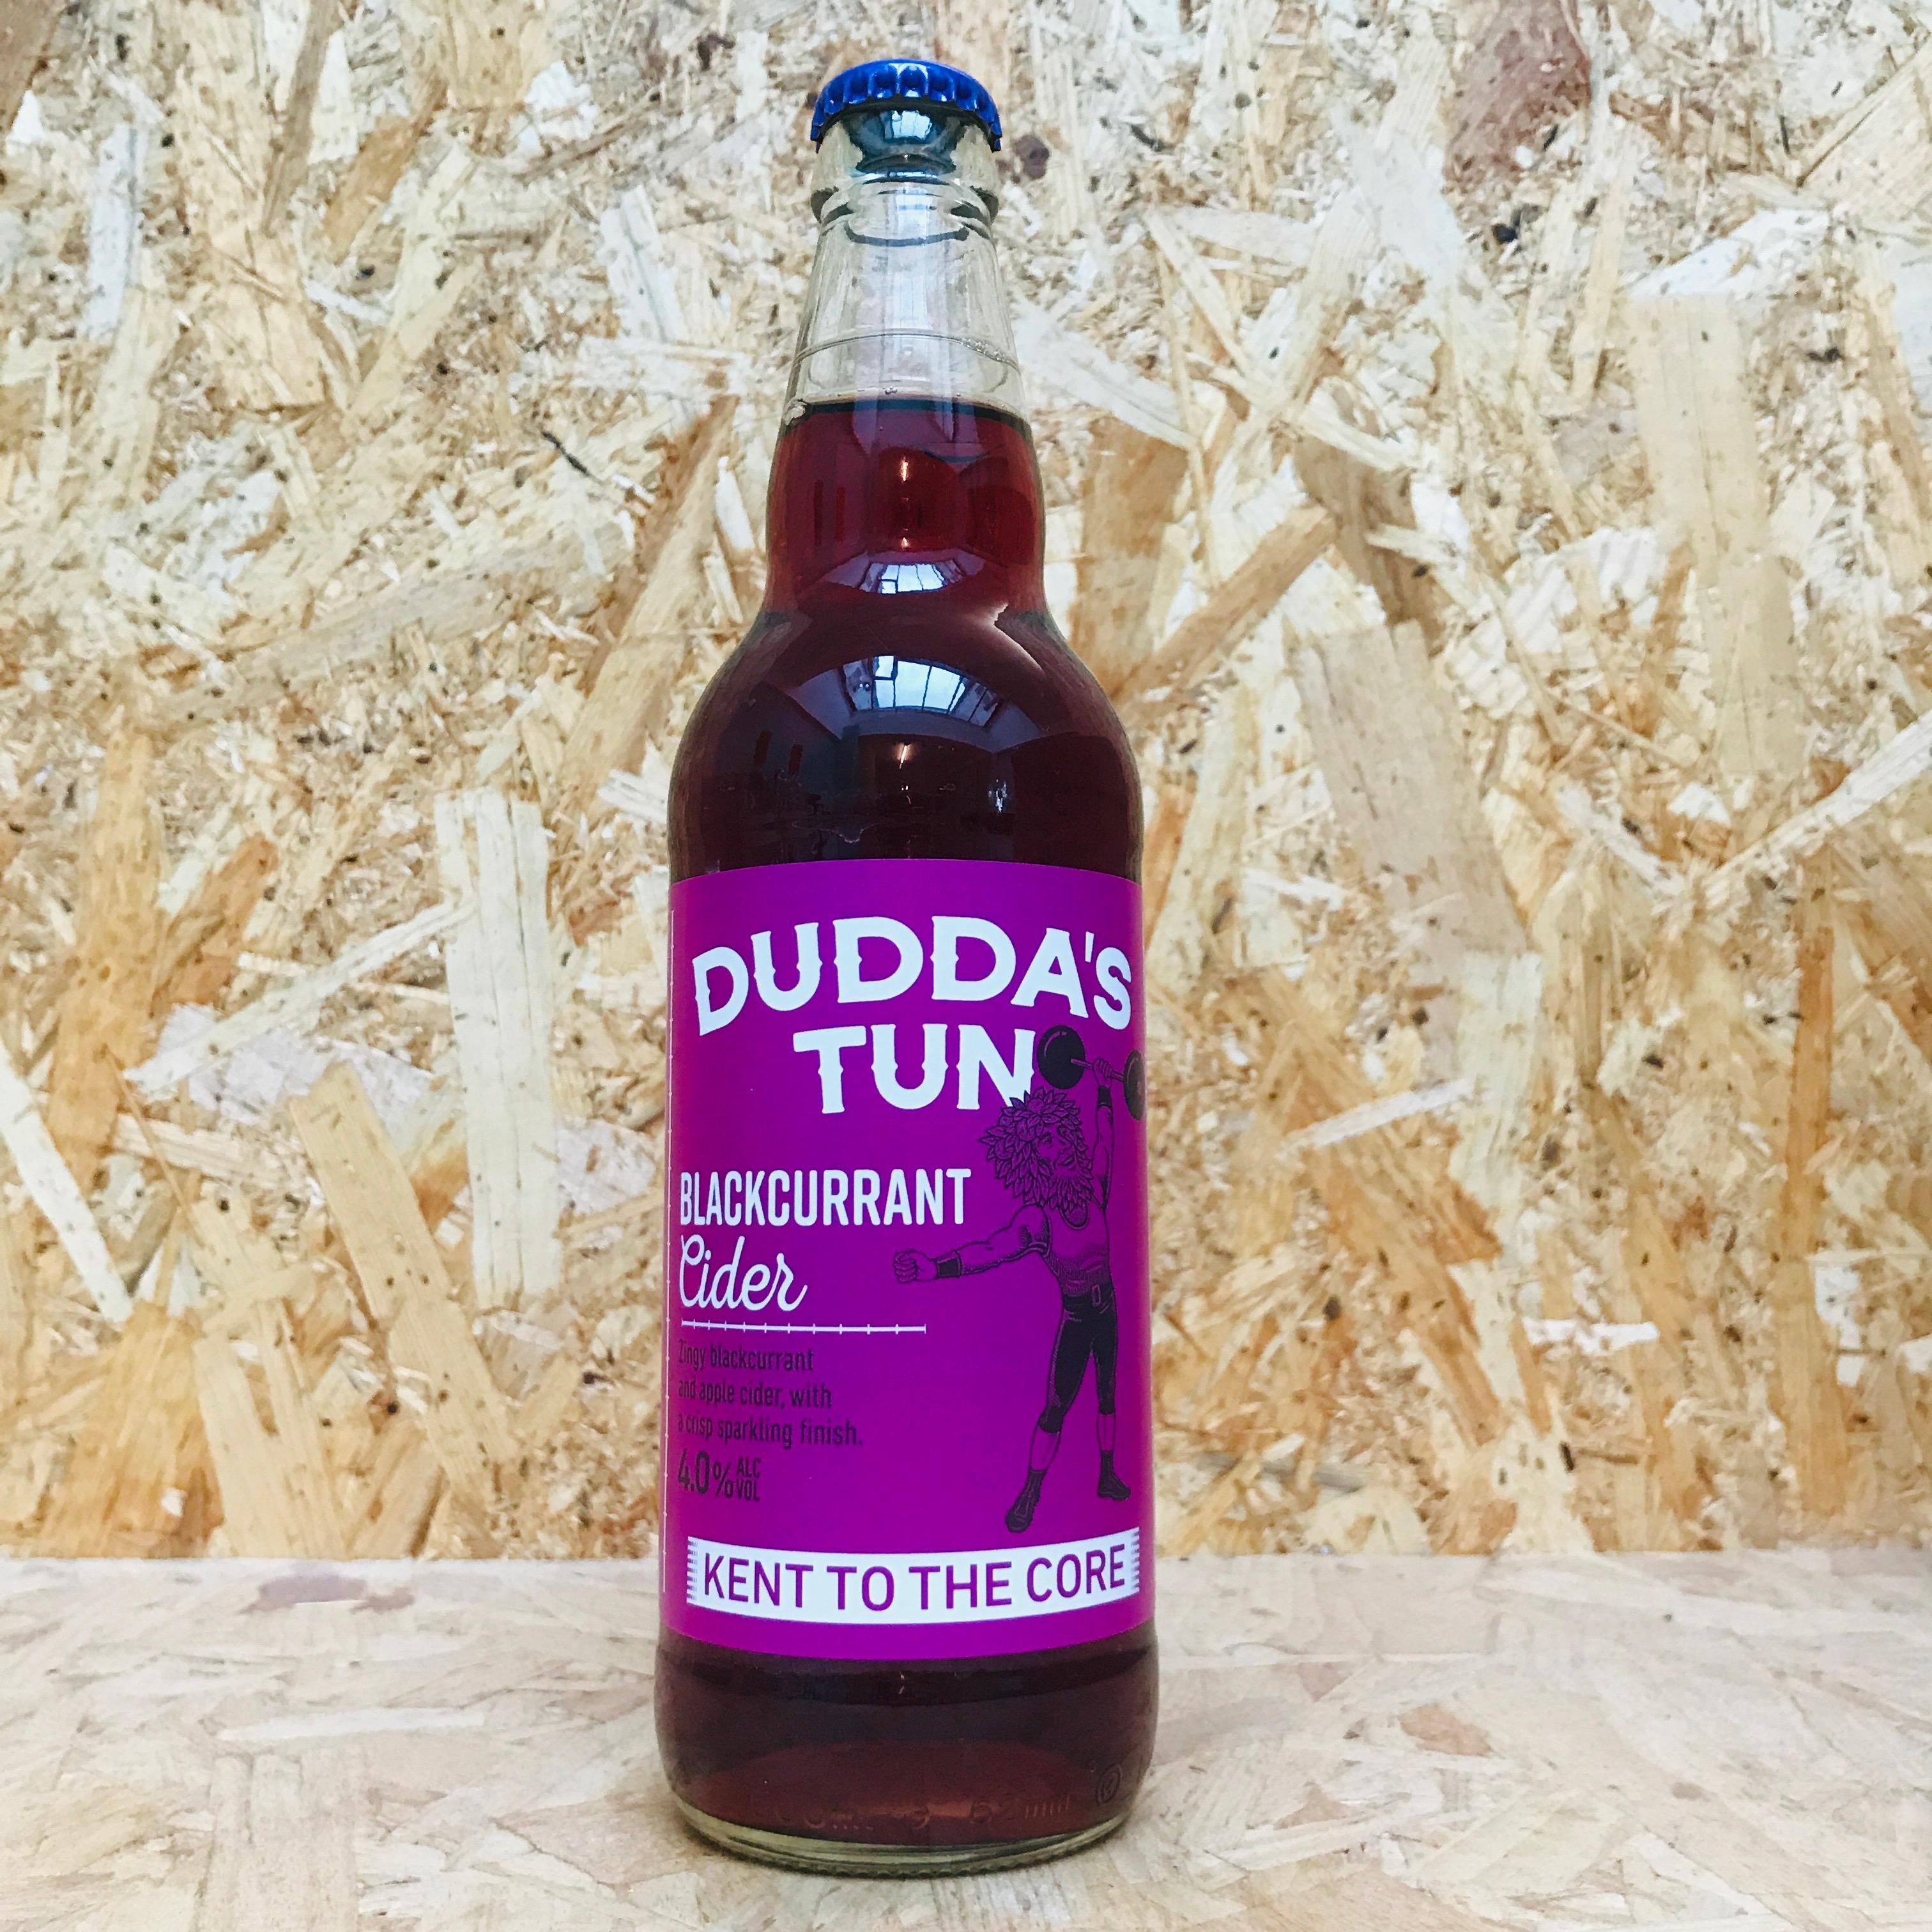 Dudda's Tun - Blackcurrant